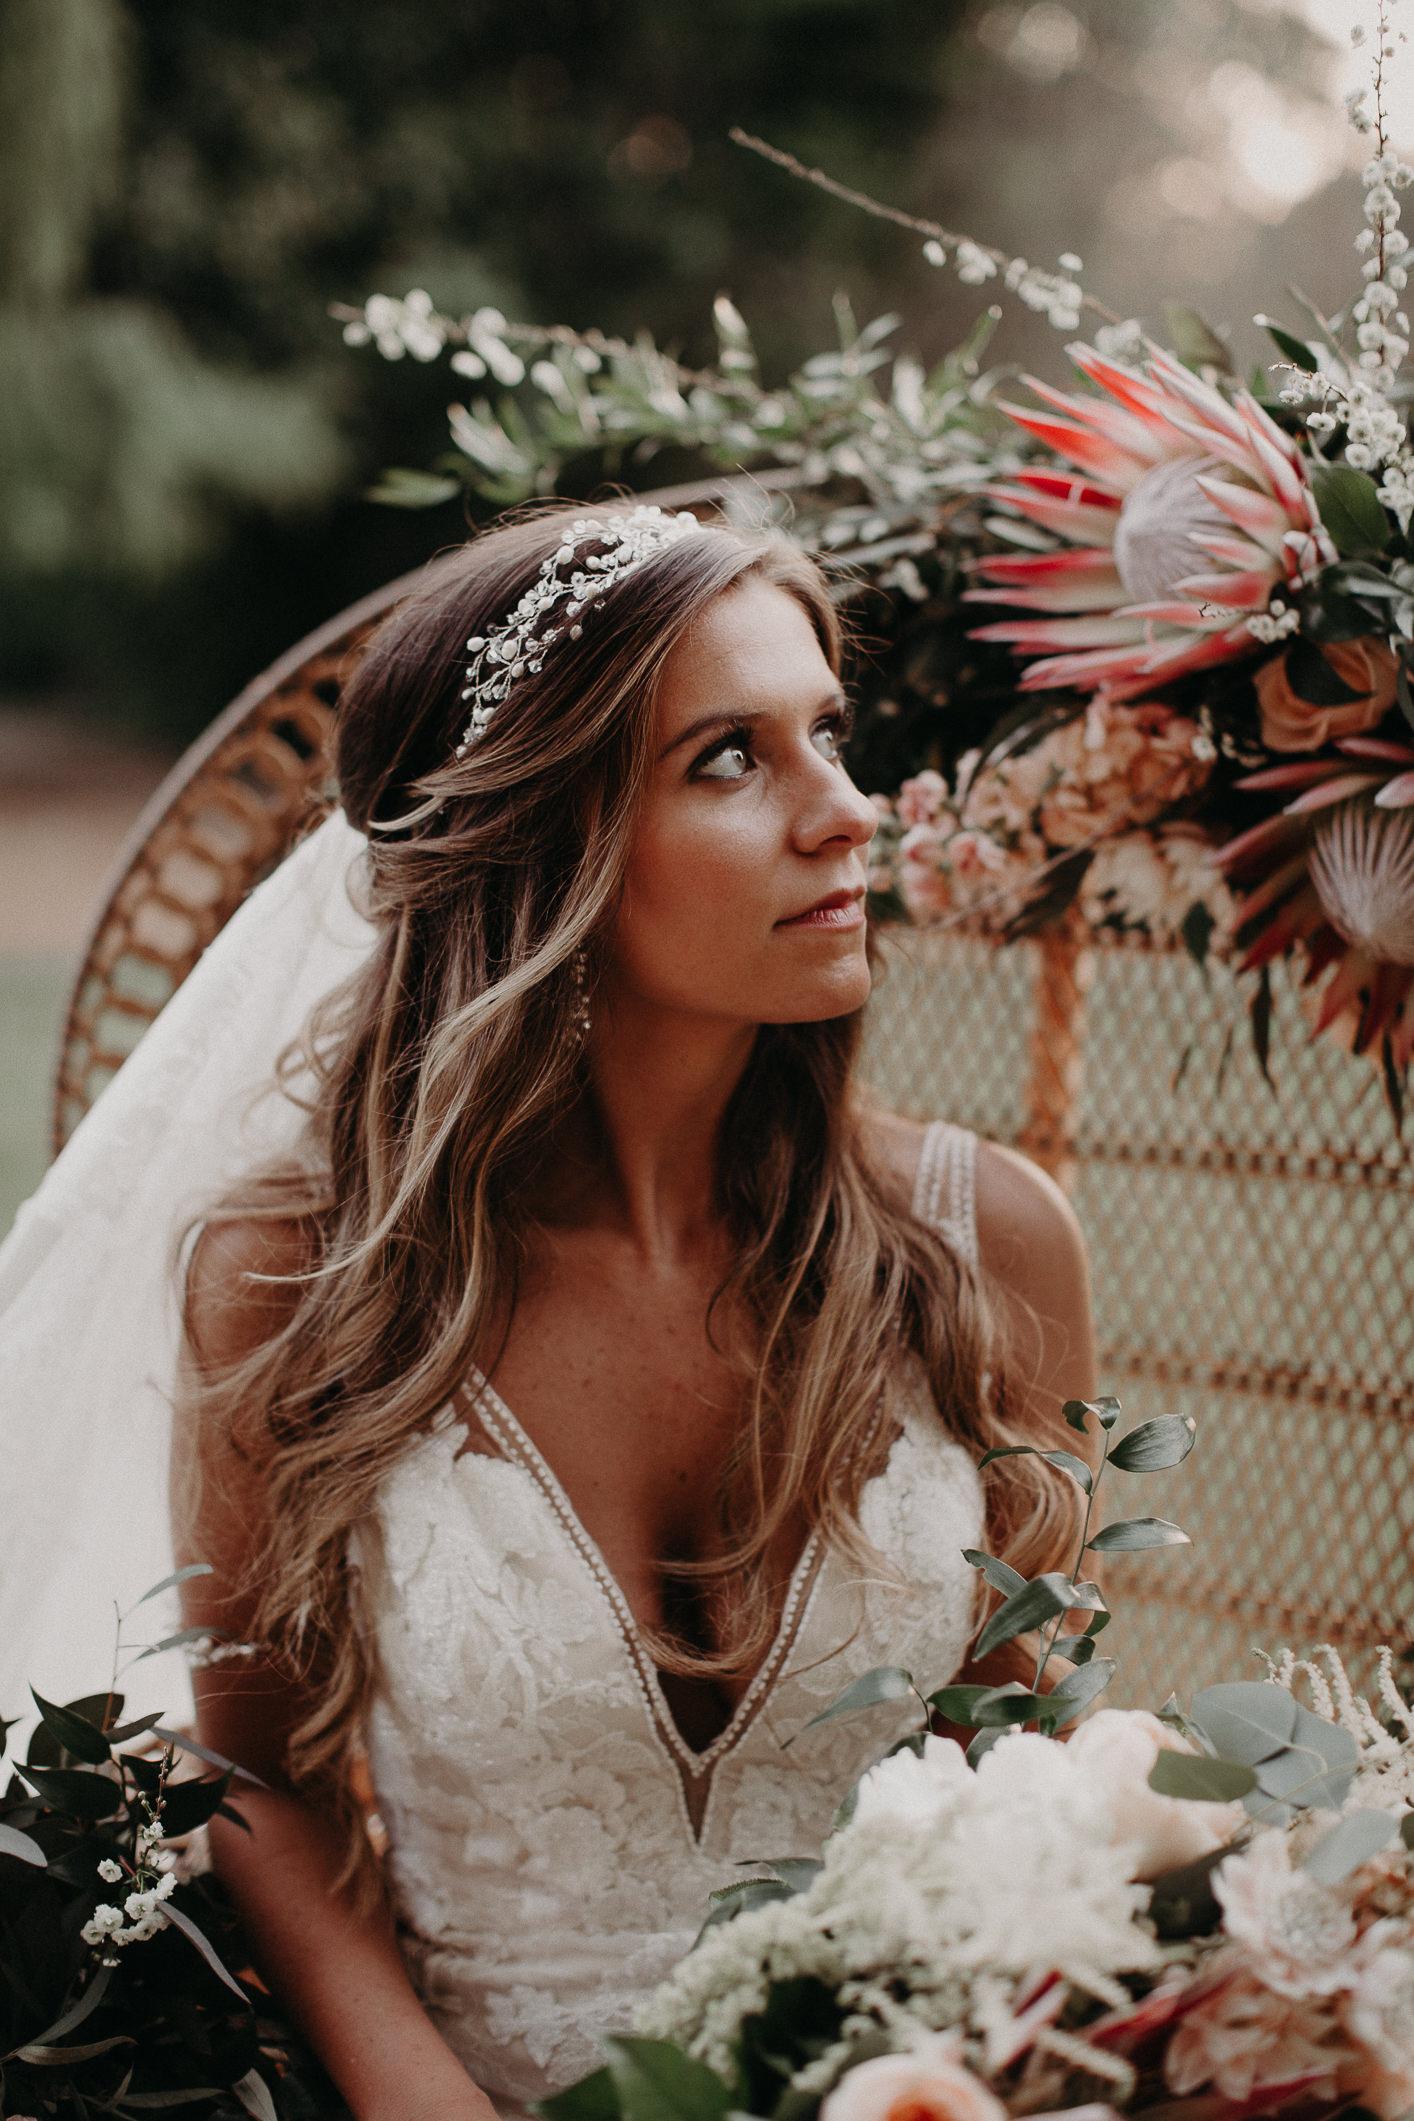 Peyton & JM - The Carl House - Atlanta wedding photographer - Aline Marin Photography _-159.JPG